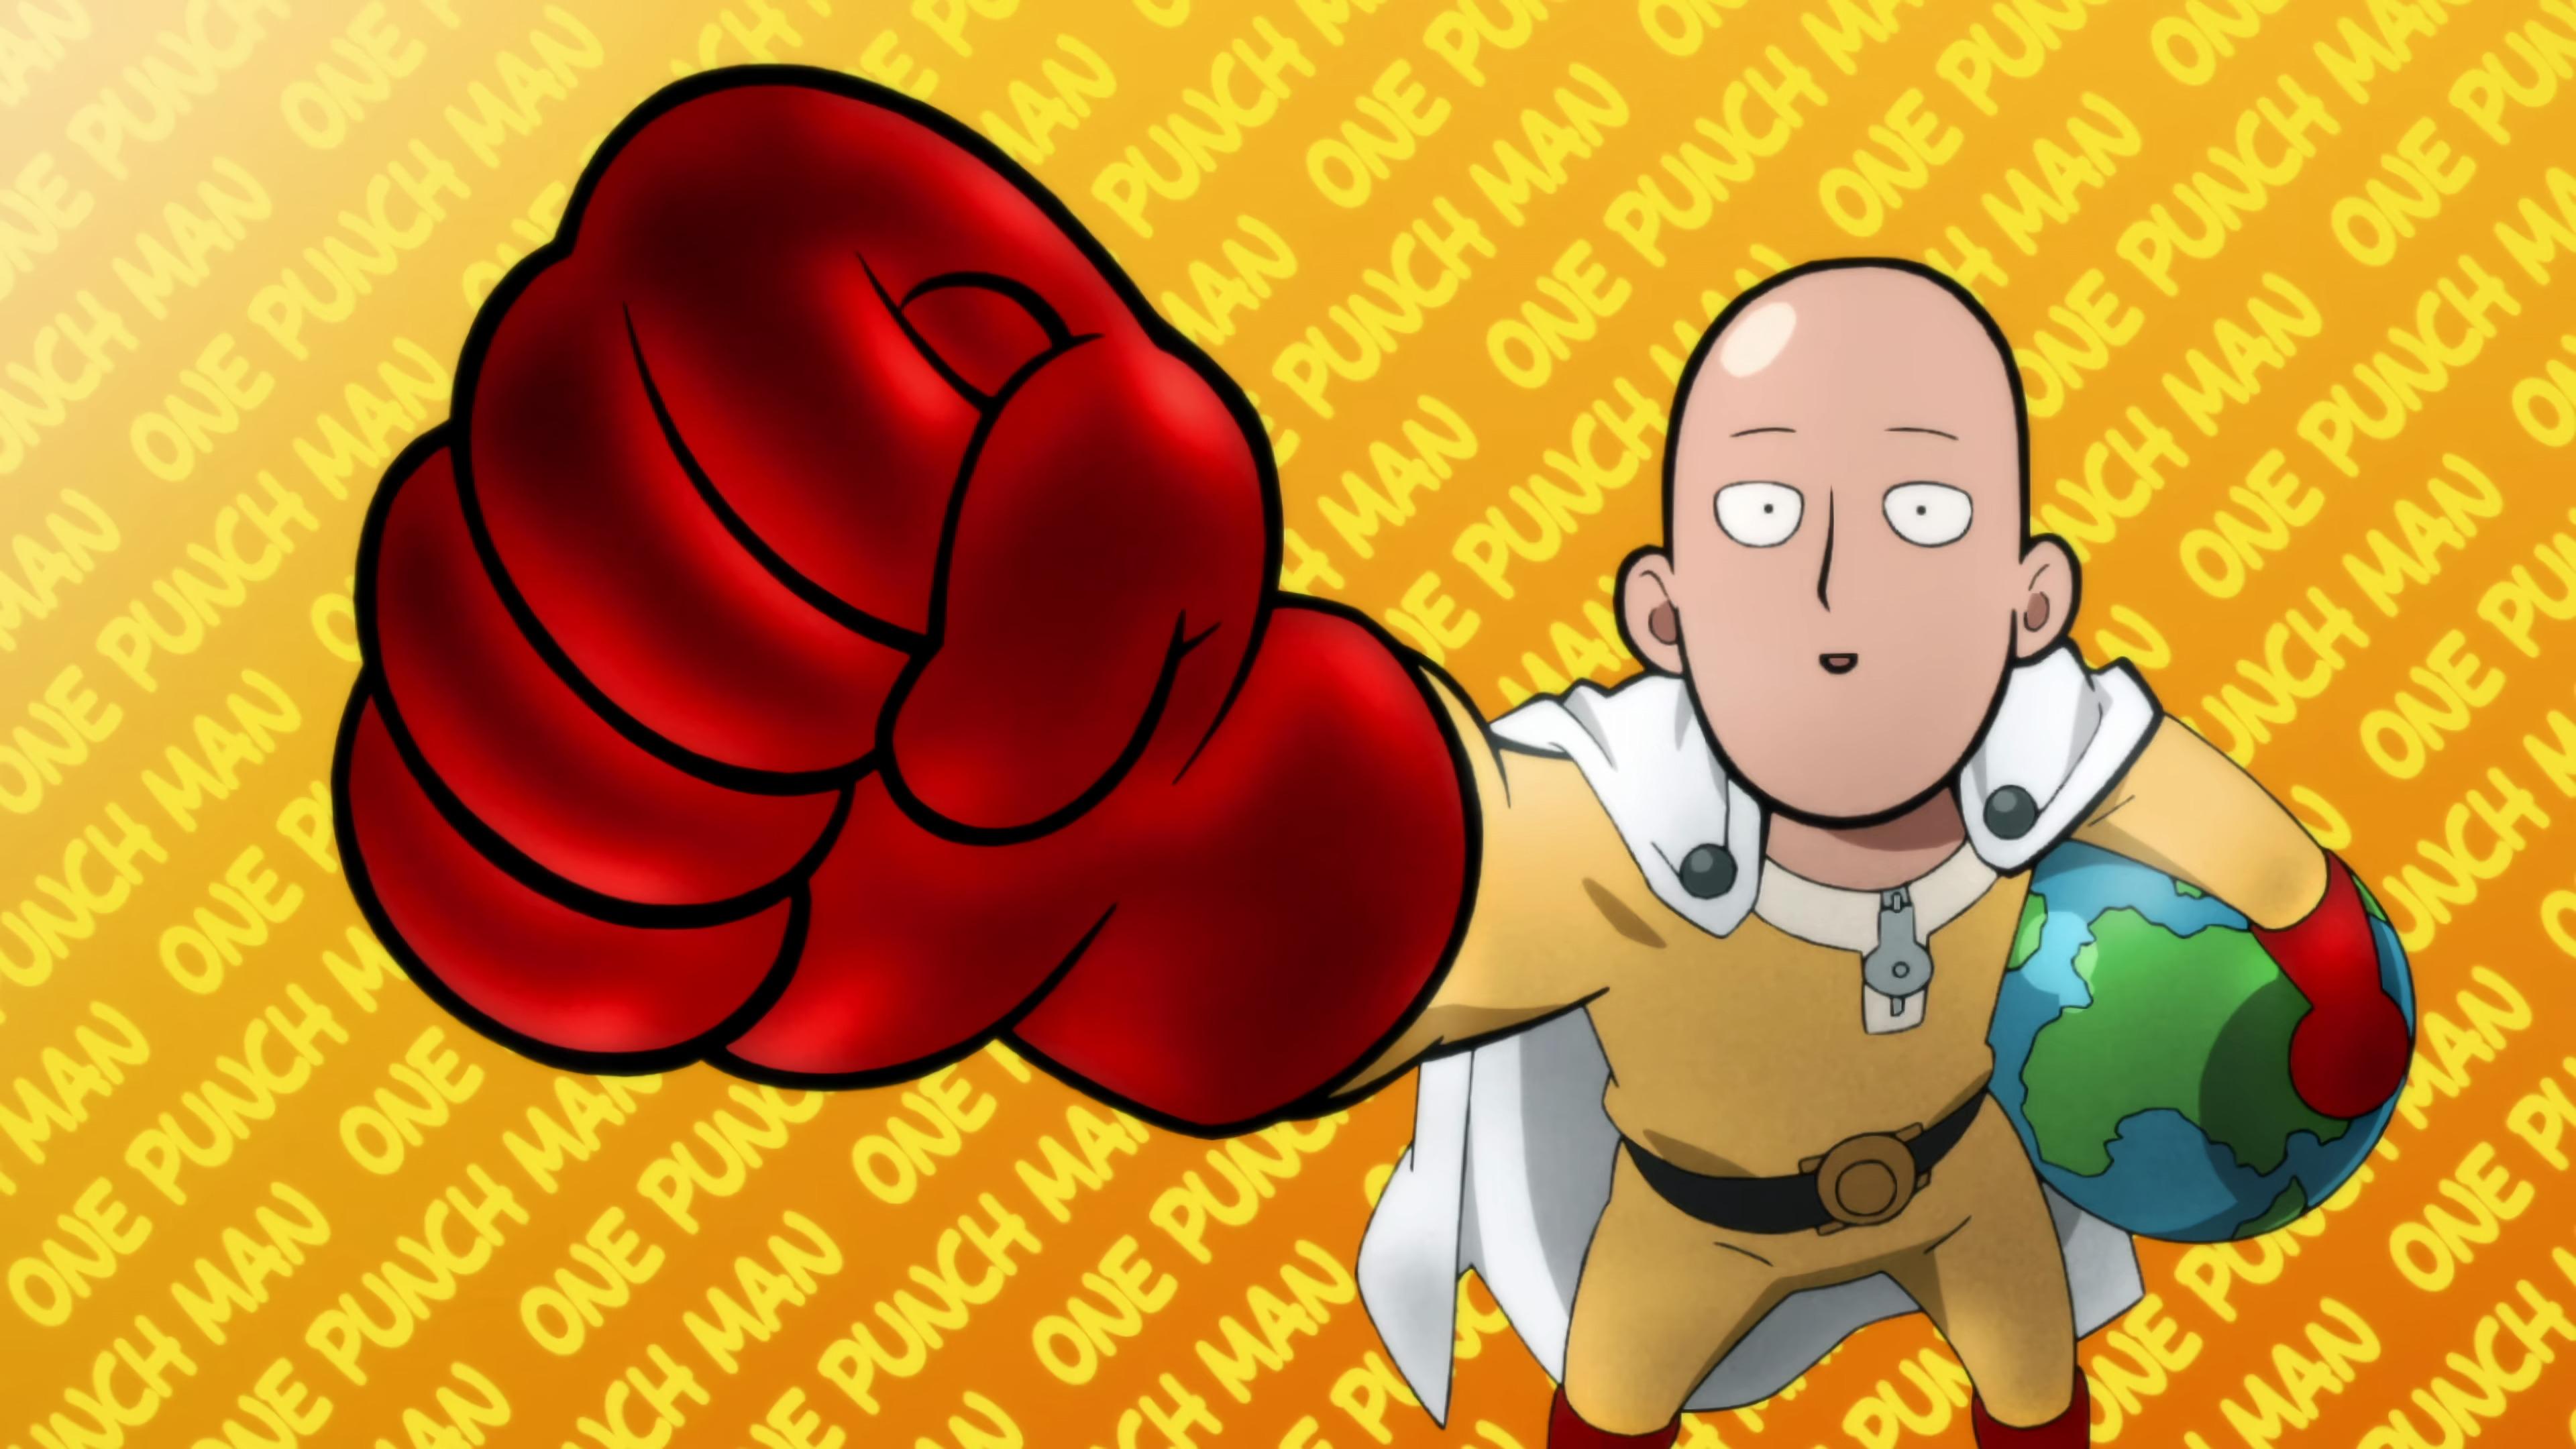 One Punch Man Saitama Lucu - One-Punch Man, Saitama, anime boys, anime, high angle ...